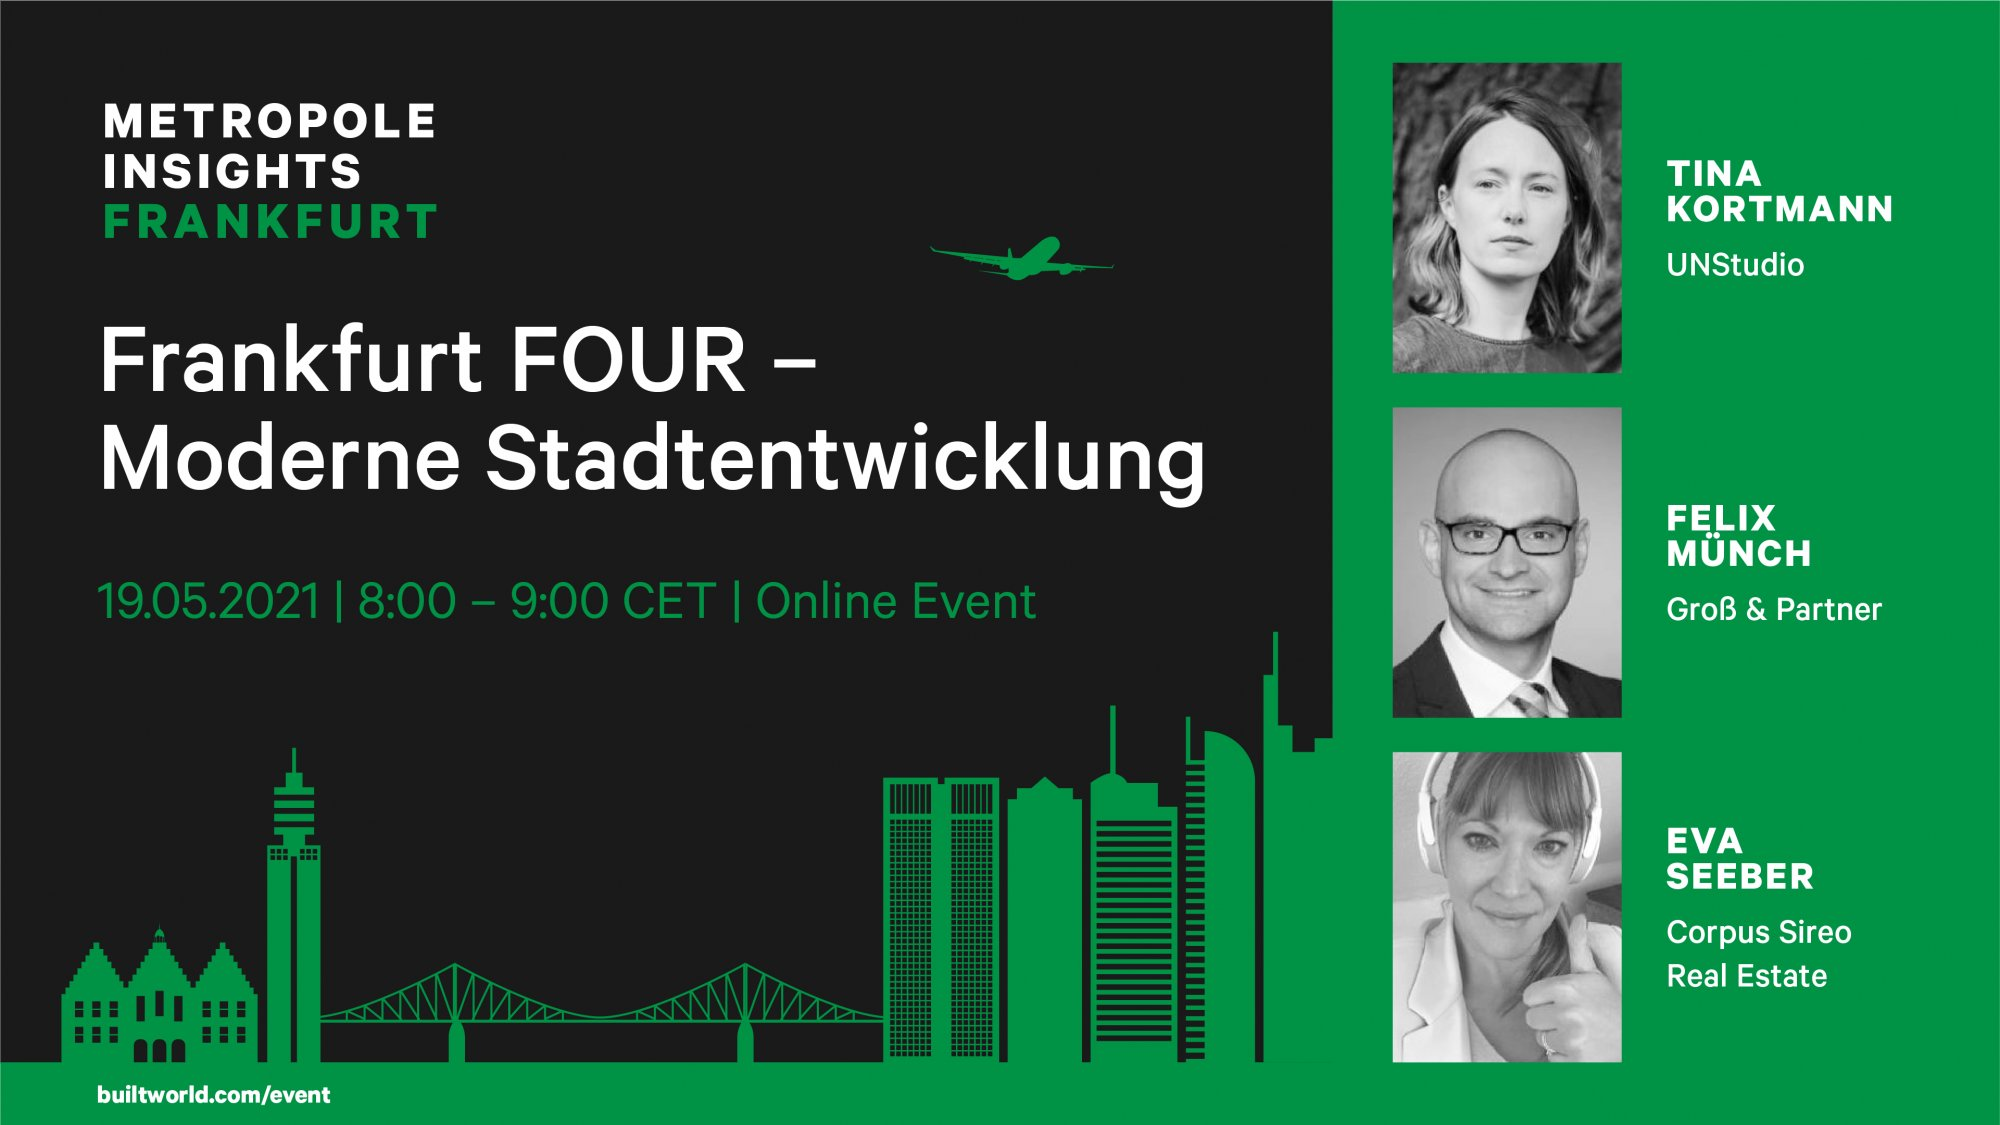 metropole-insights-frankfurt-frankfurt-four-moderne-stadtentwicklung